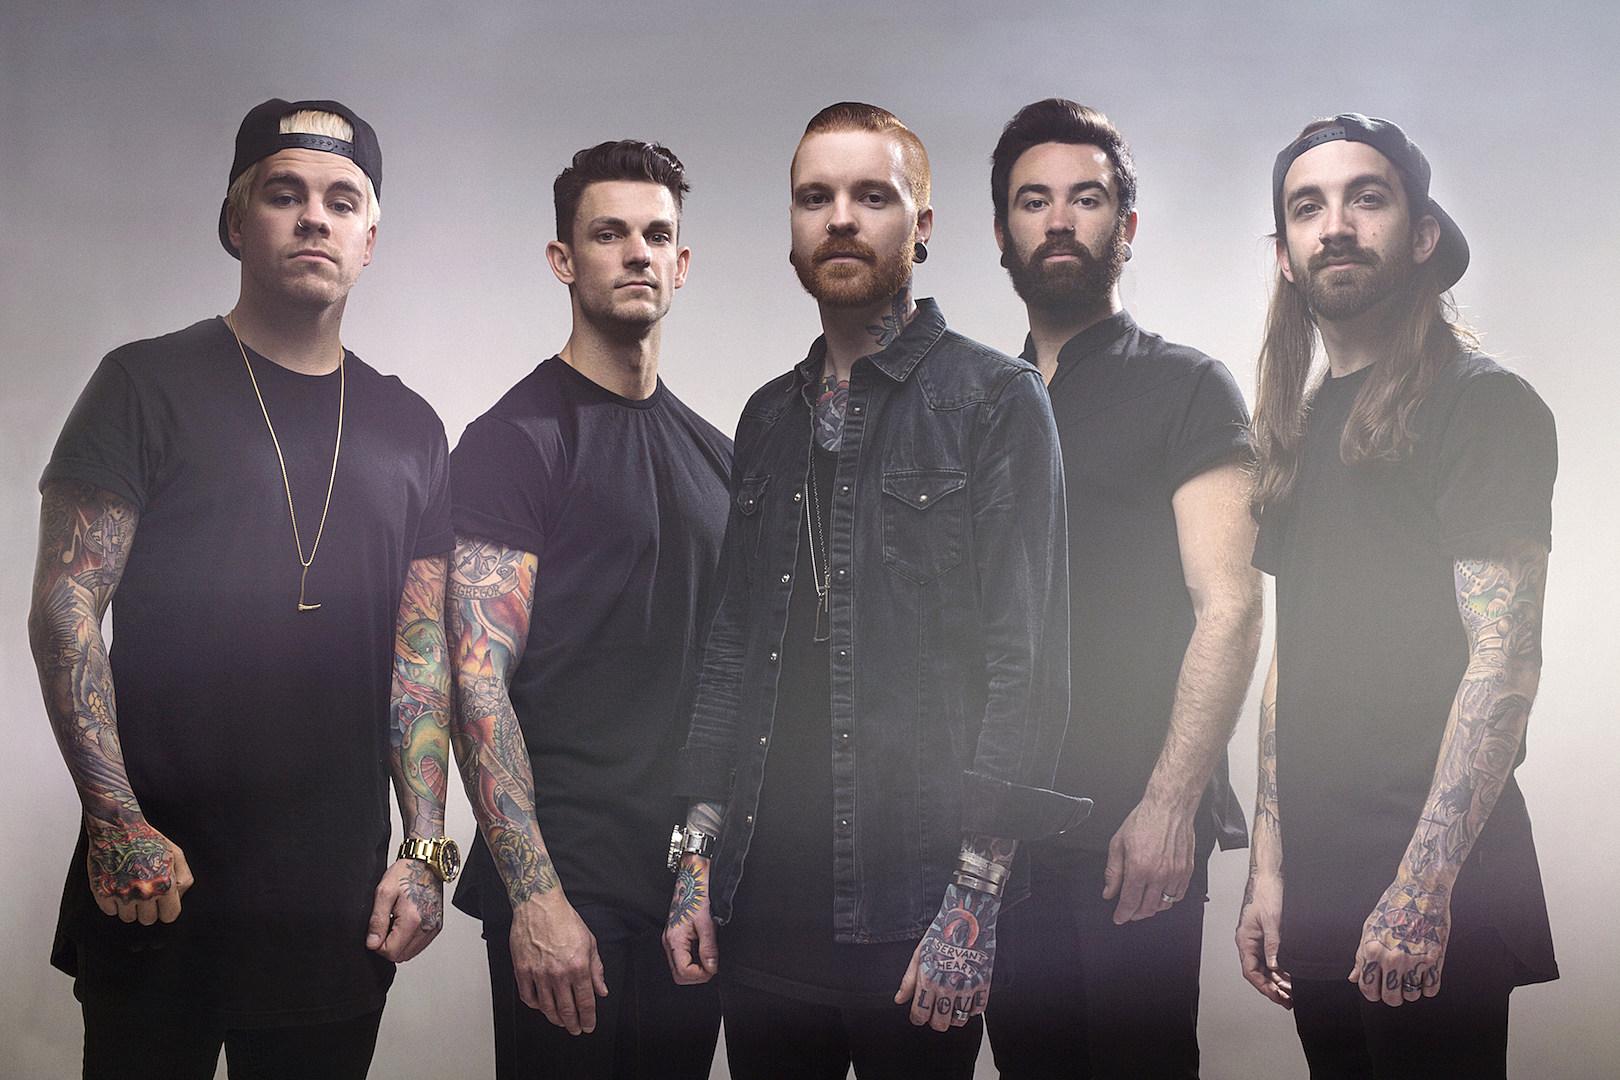 Memphis May Fire Cover Linkin Park's 'Faint'